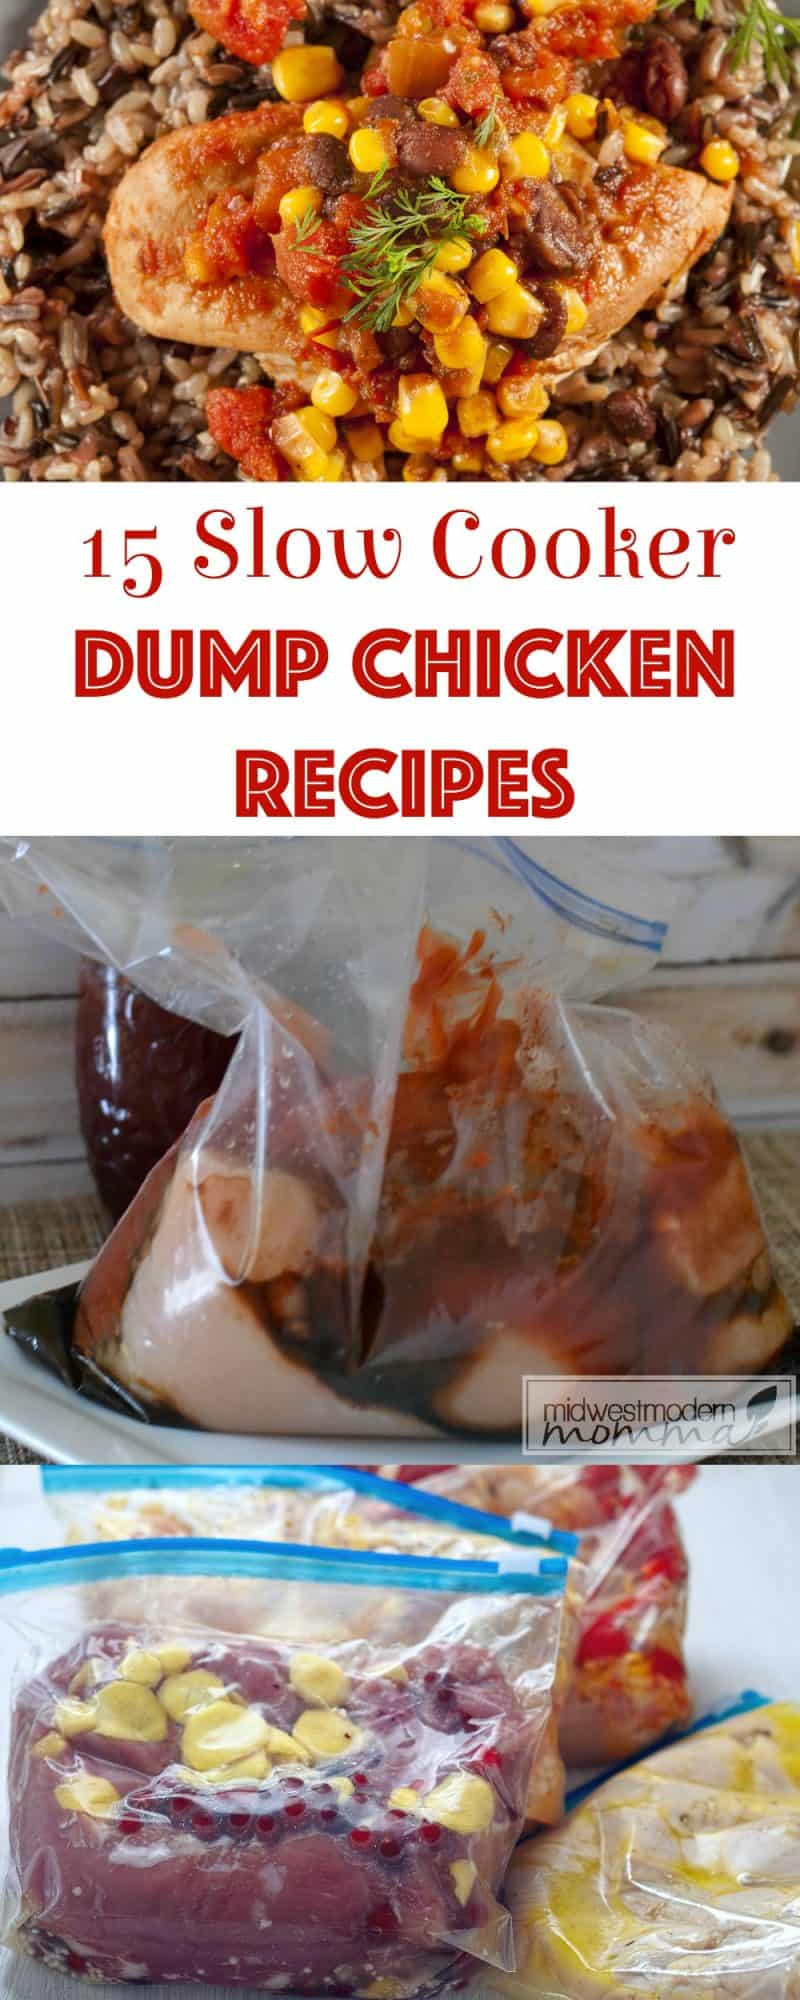 15 Crock Pot Dump Chicken Recipes